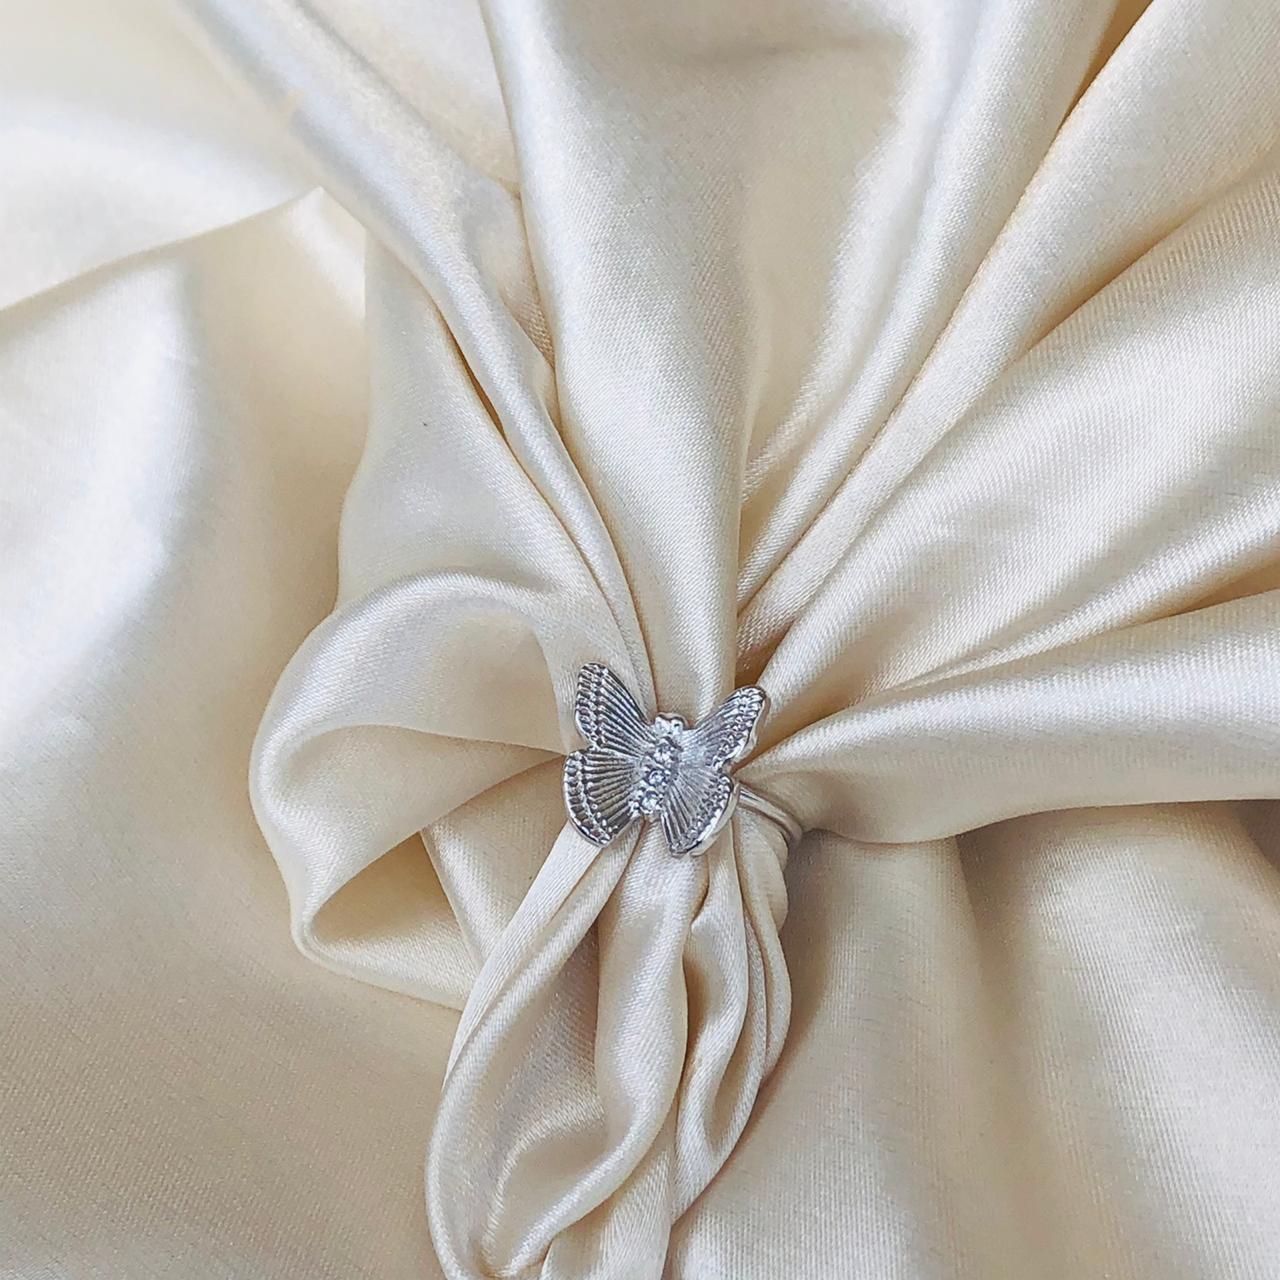 Anel de Borboleta G Banhada em Ródio Branco